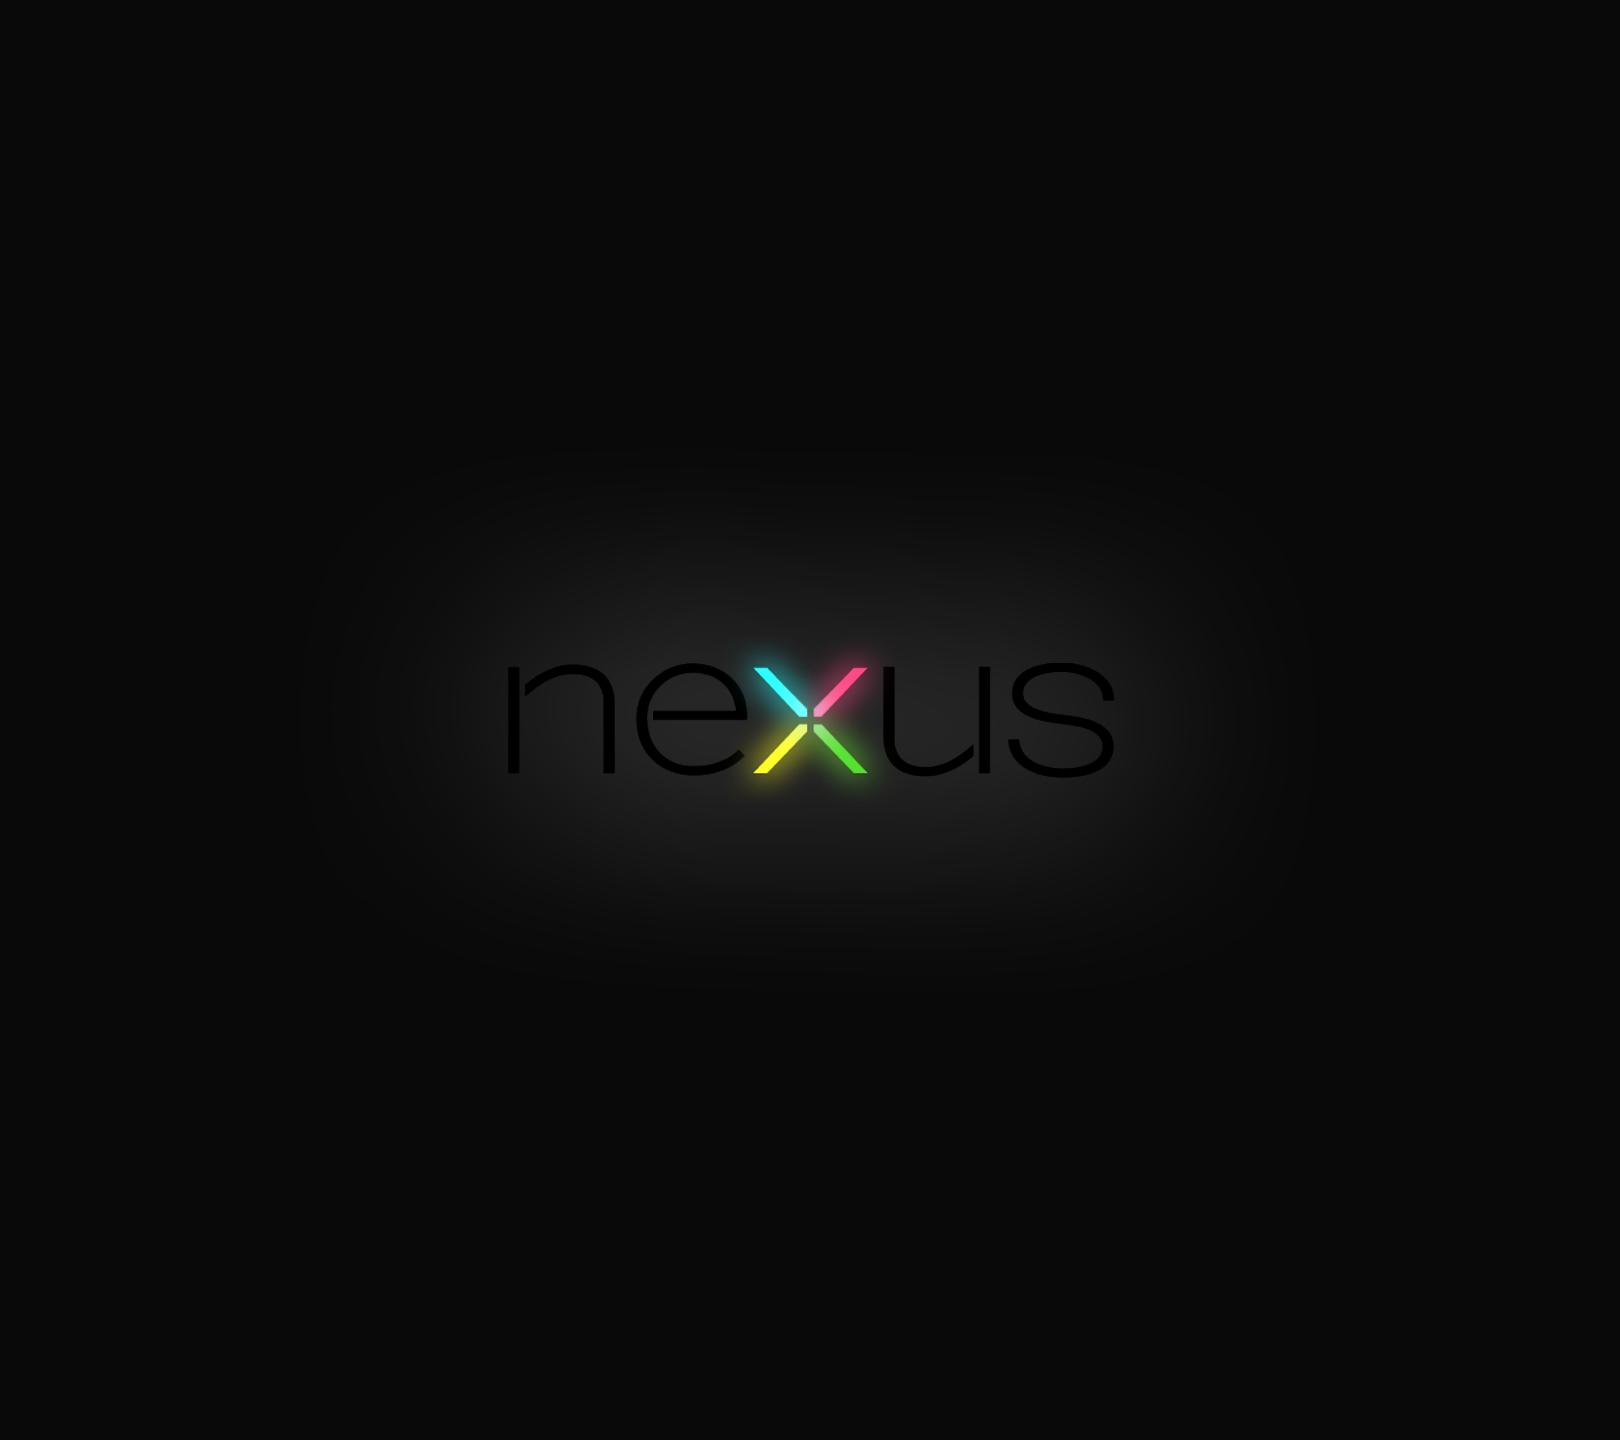 47] Desktop Nexus Wallpaper on WallpaperSafari 1620x1440